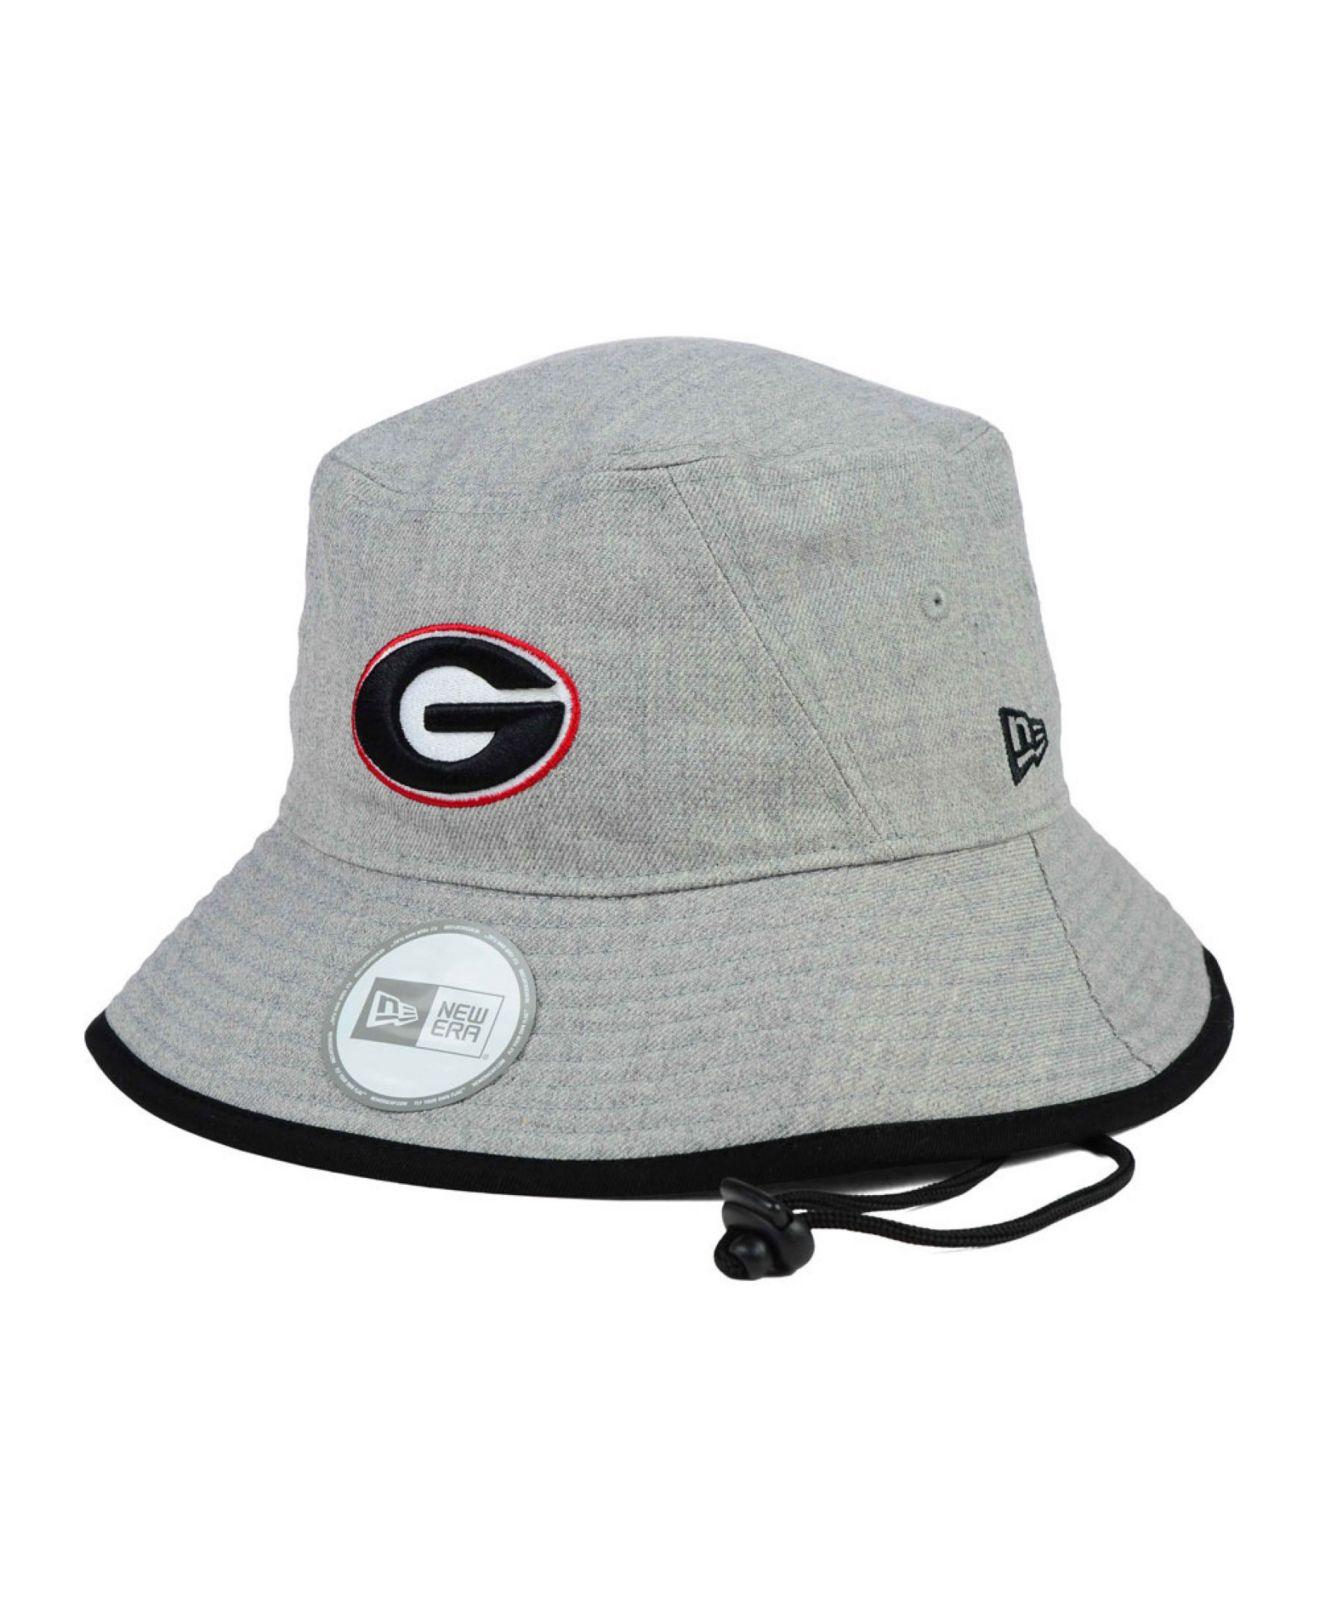 2861234b2f0 Lyst - KTZ Georgia Bulldogs Tip Bucket Hat in Gray for Men